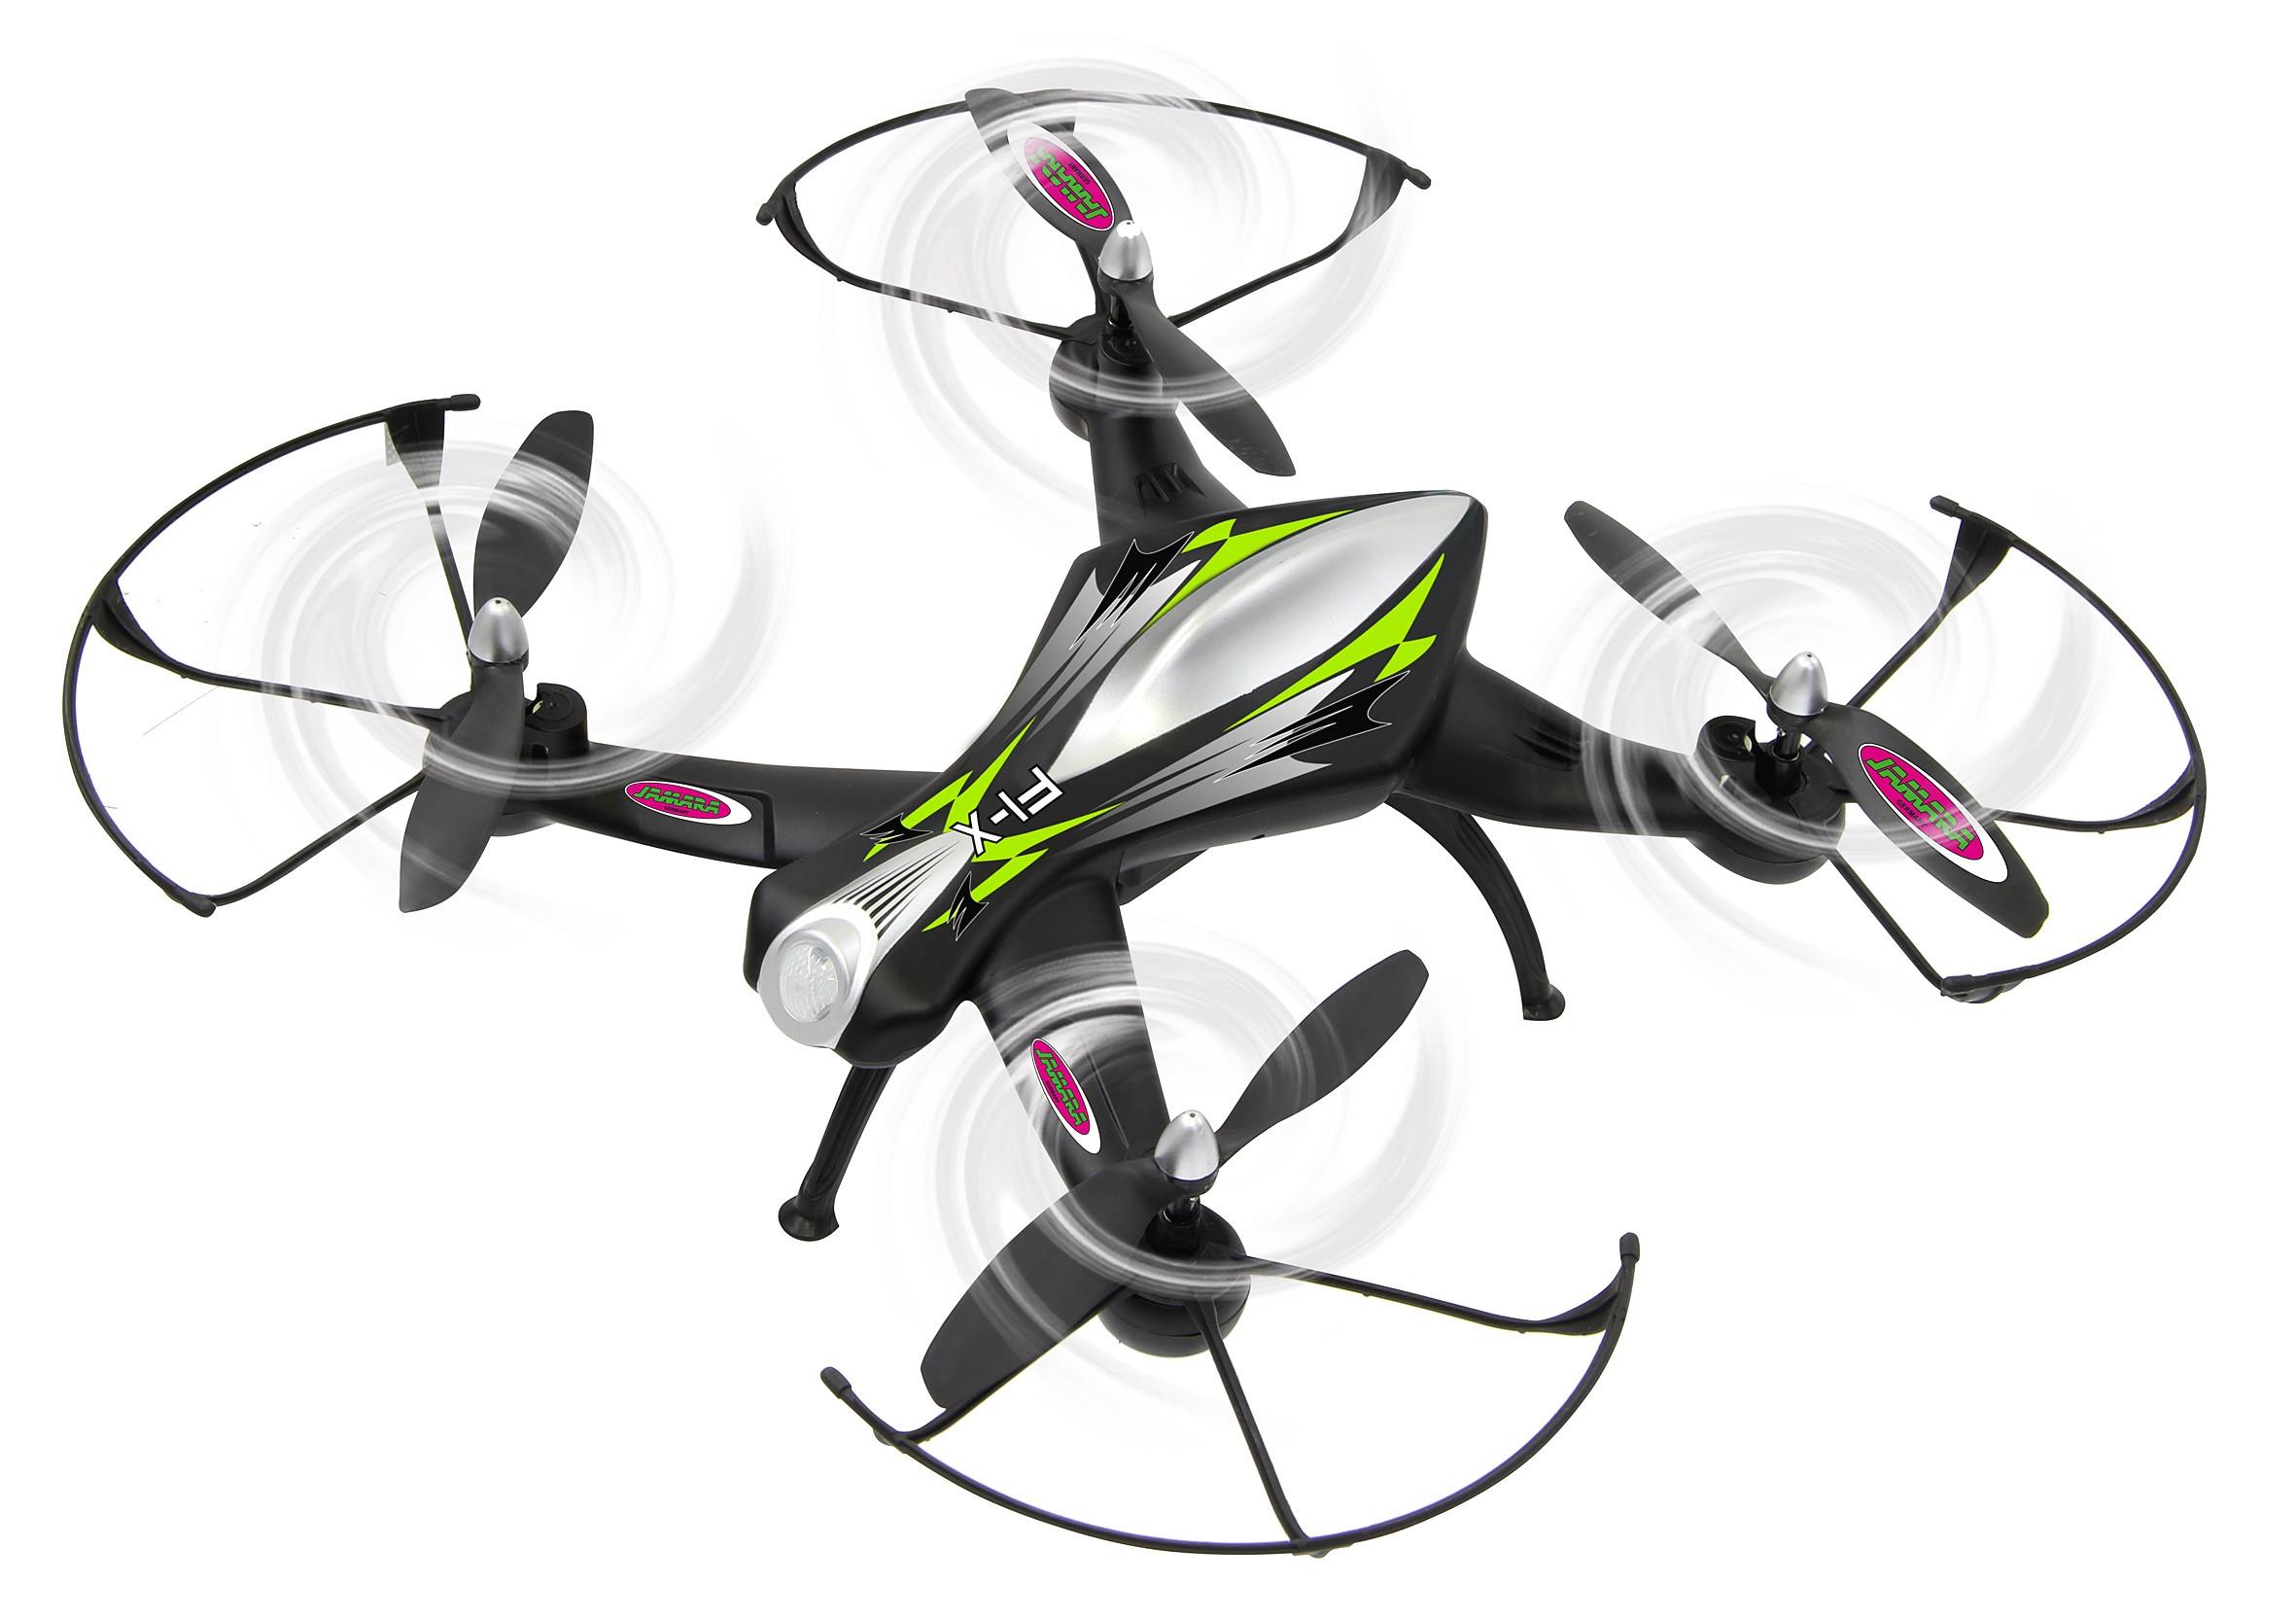 F1X Quadrocopter Wifi FPV AHP Altitude Hold Adjustment